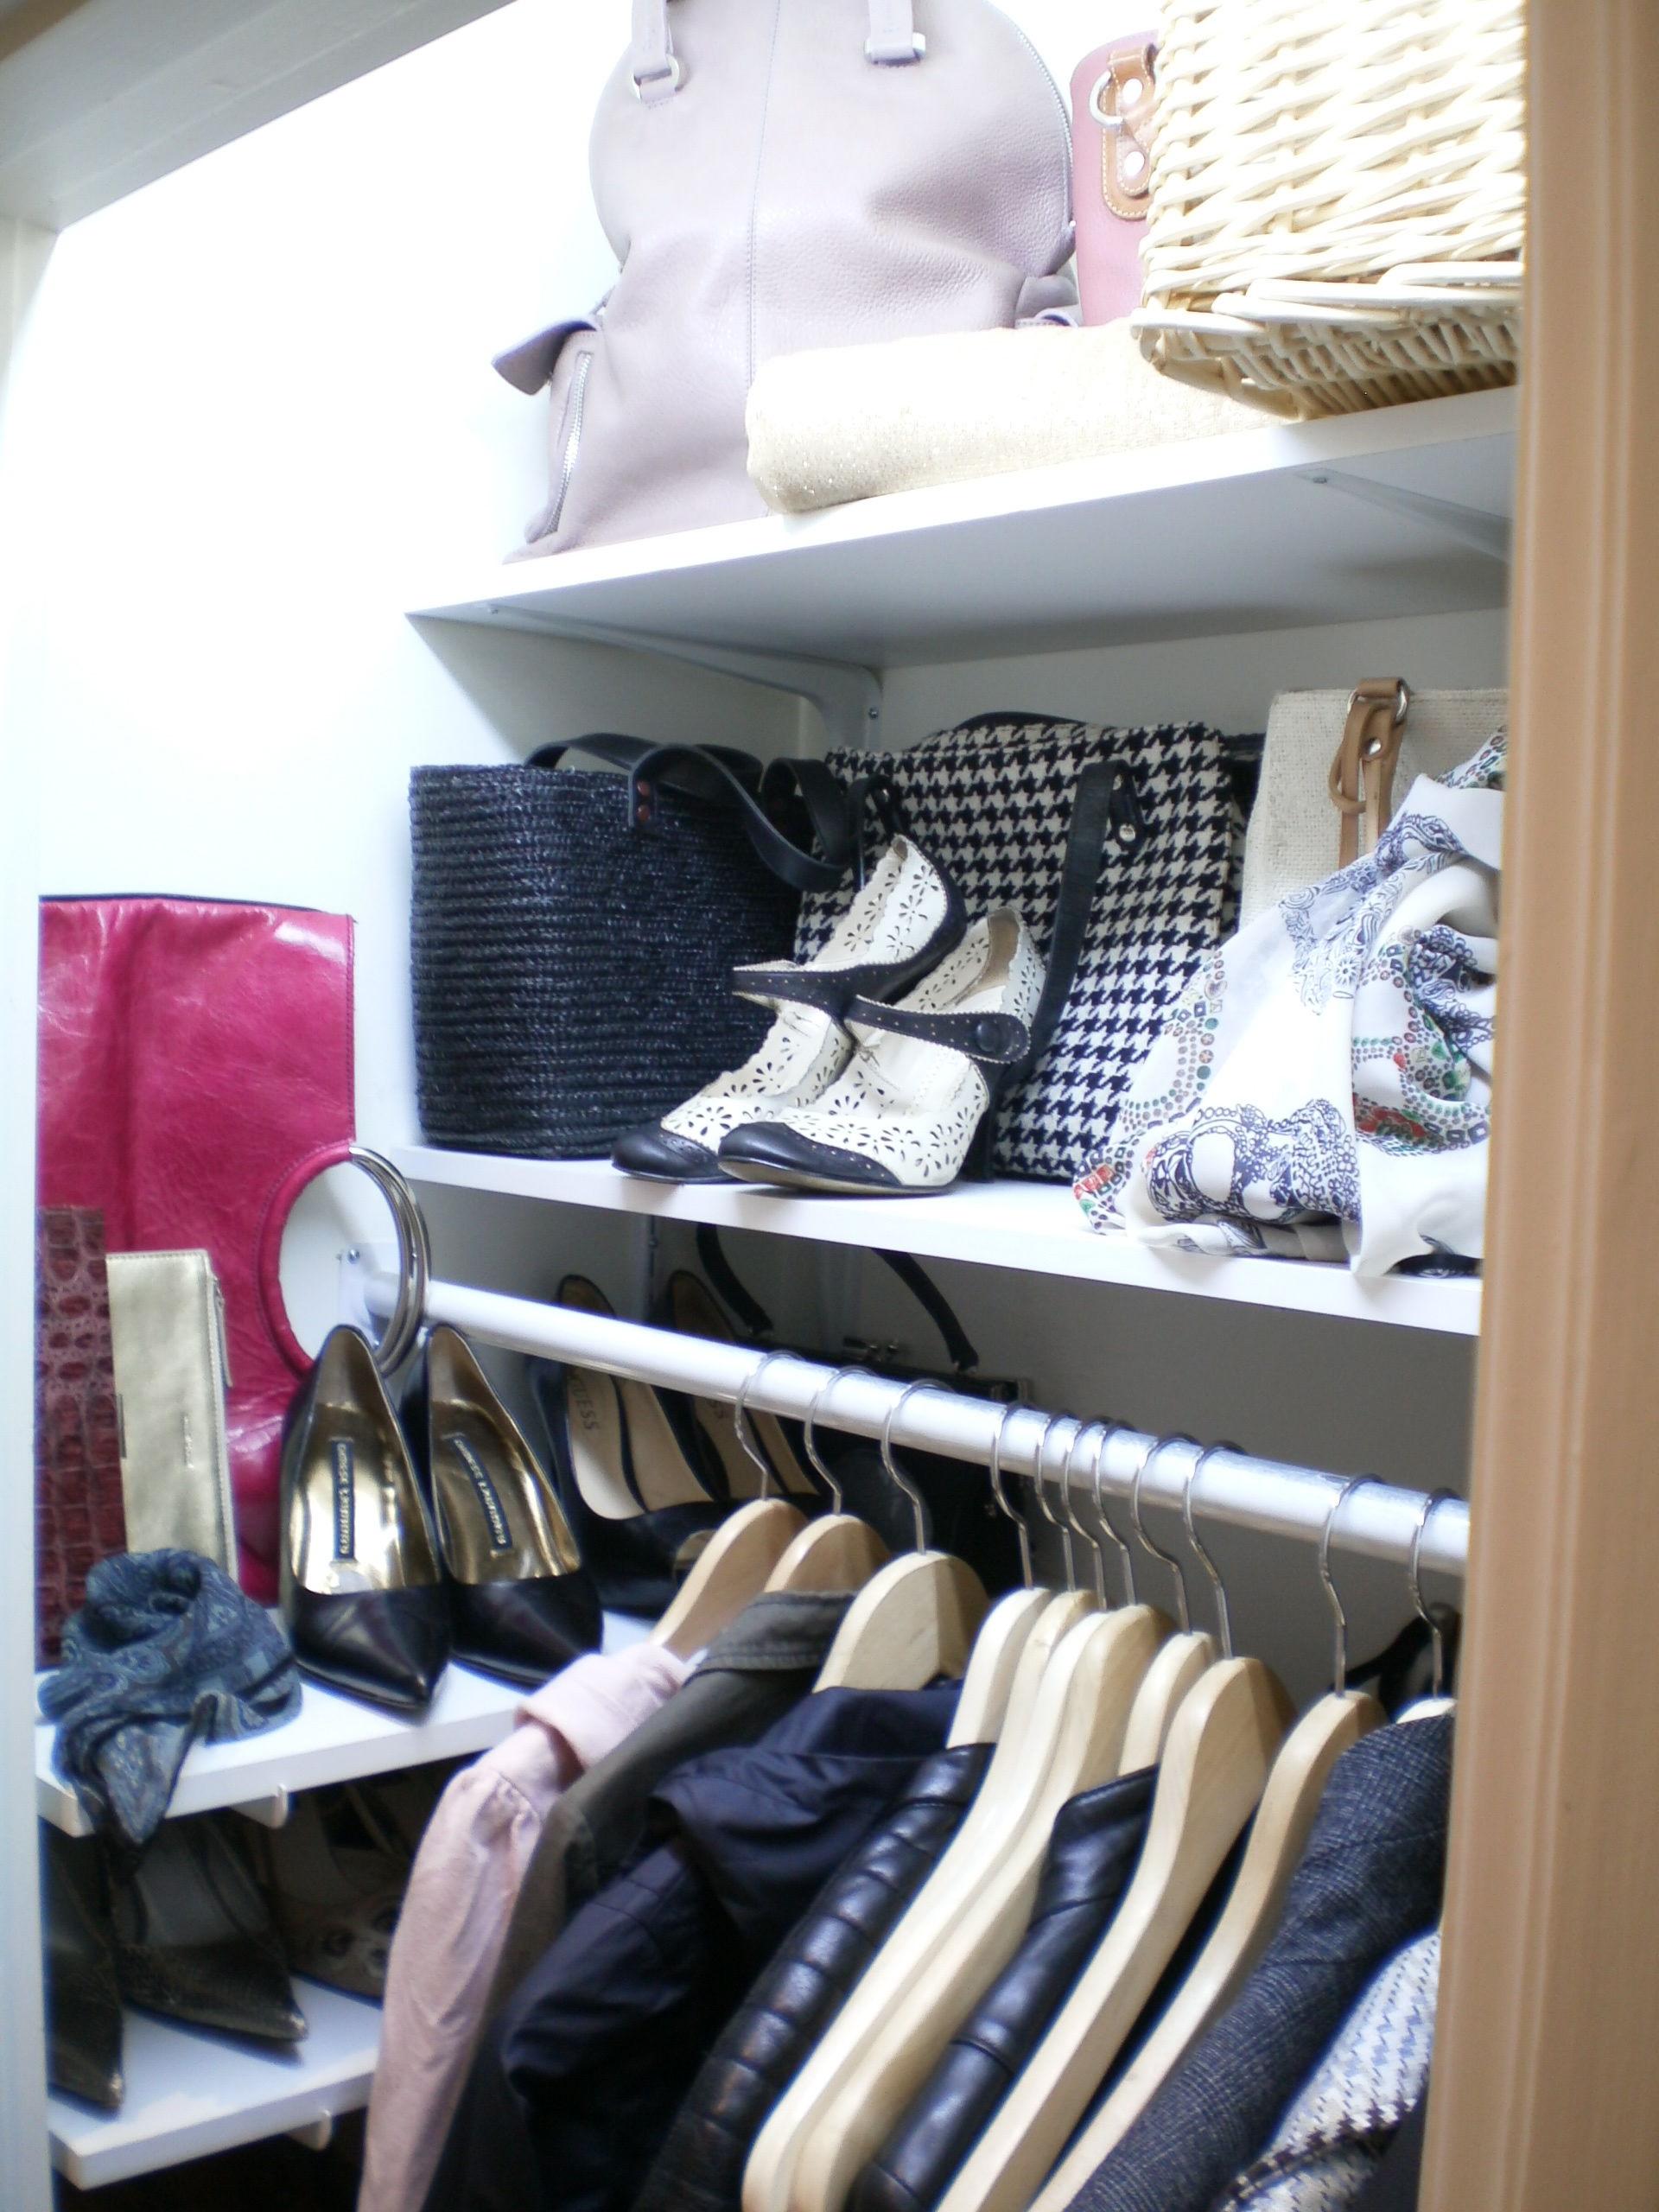 The Closet Shrink: Spring Fling(ing)